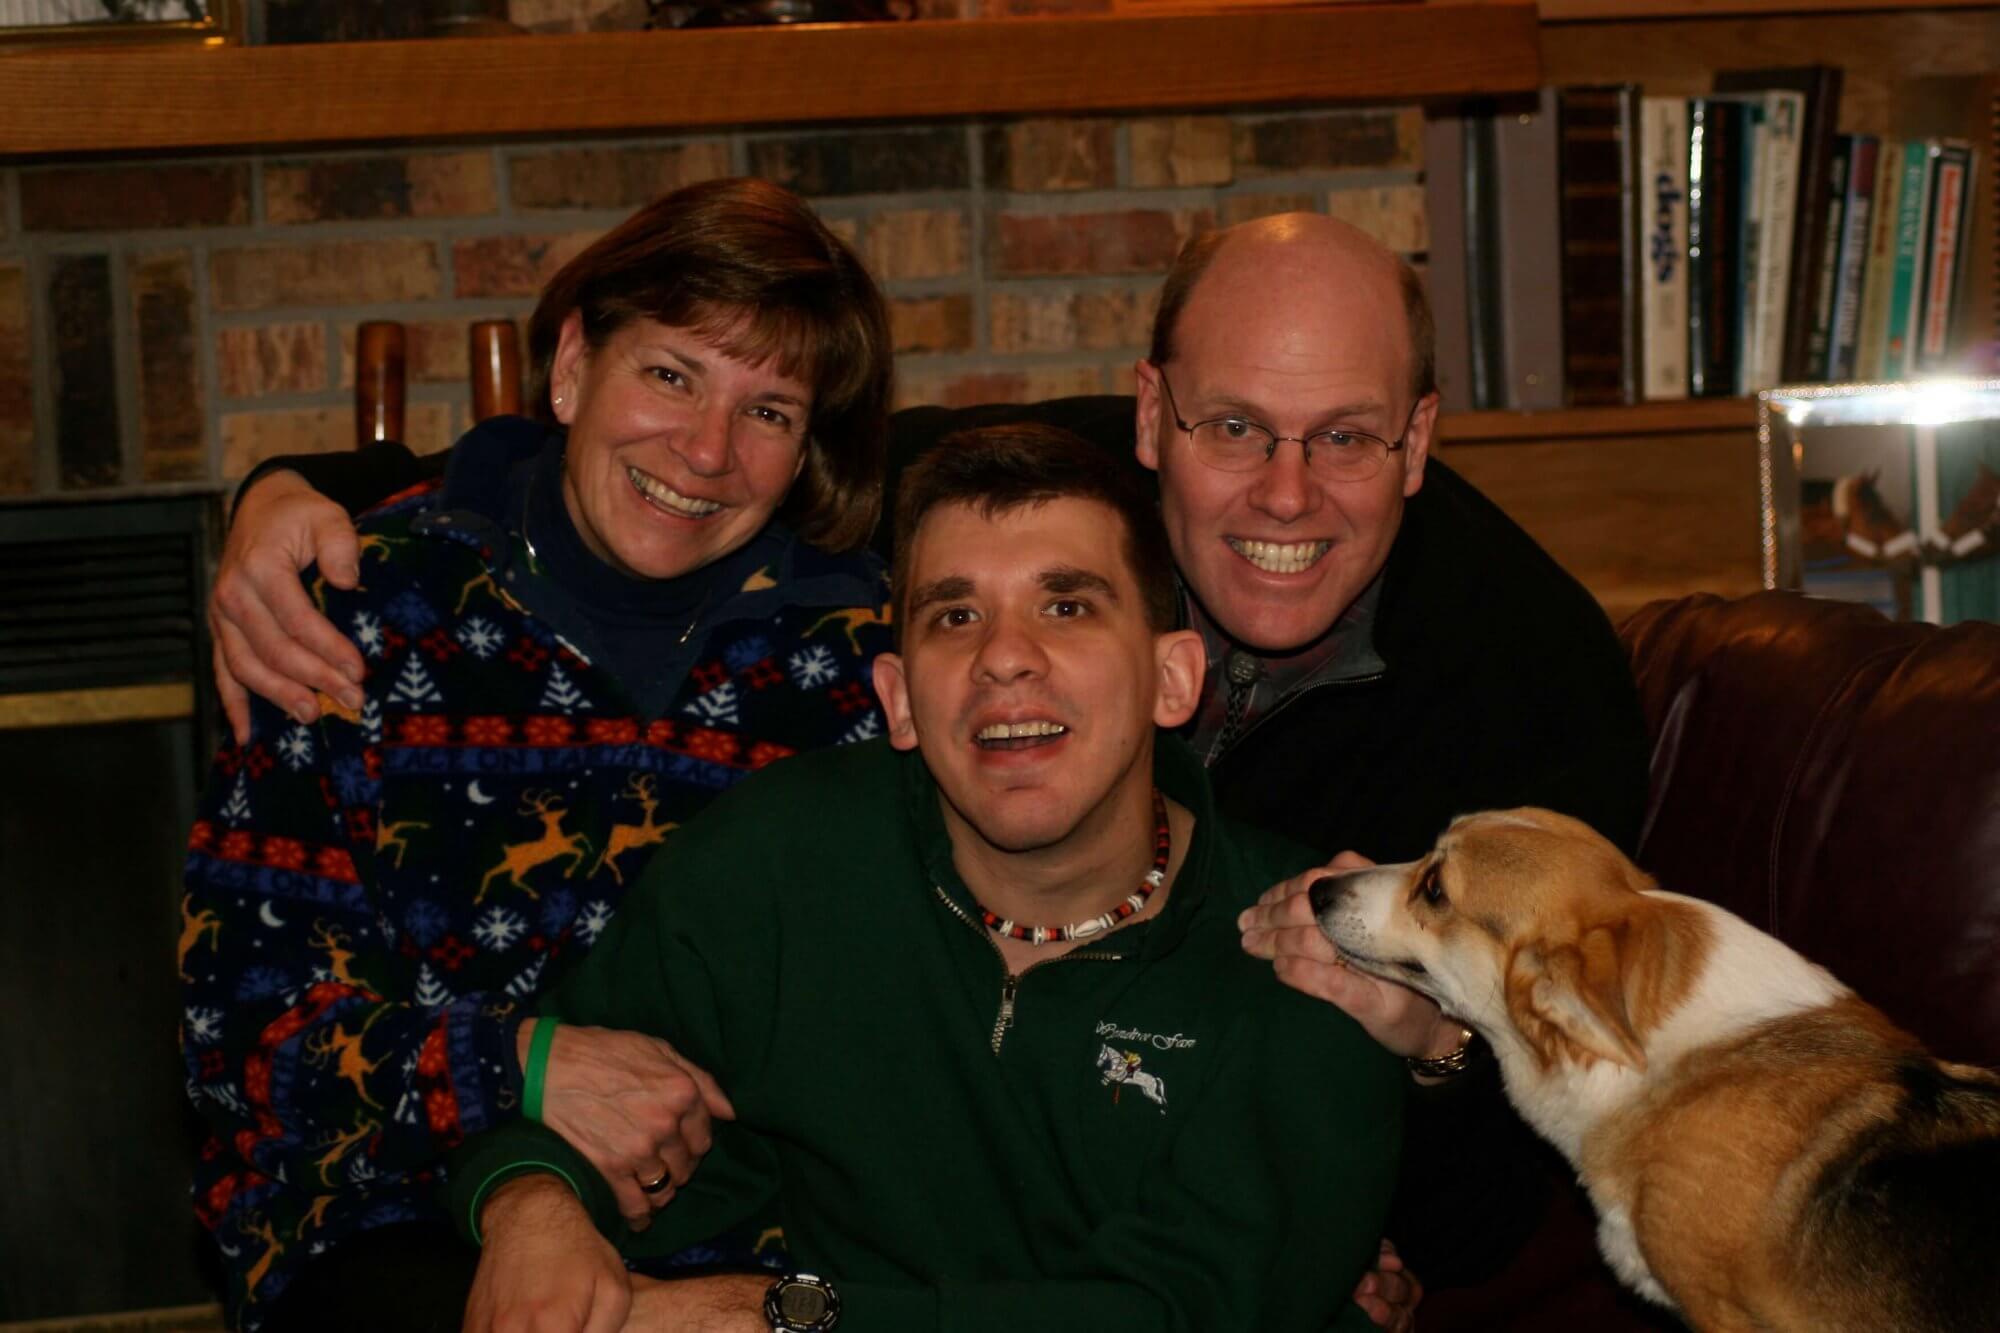 Fragile X family with dog